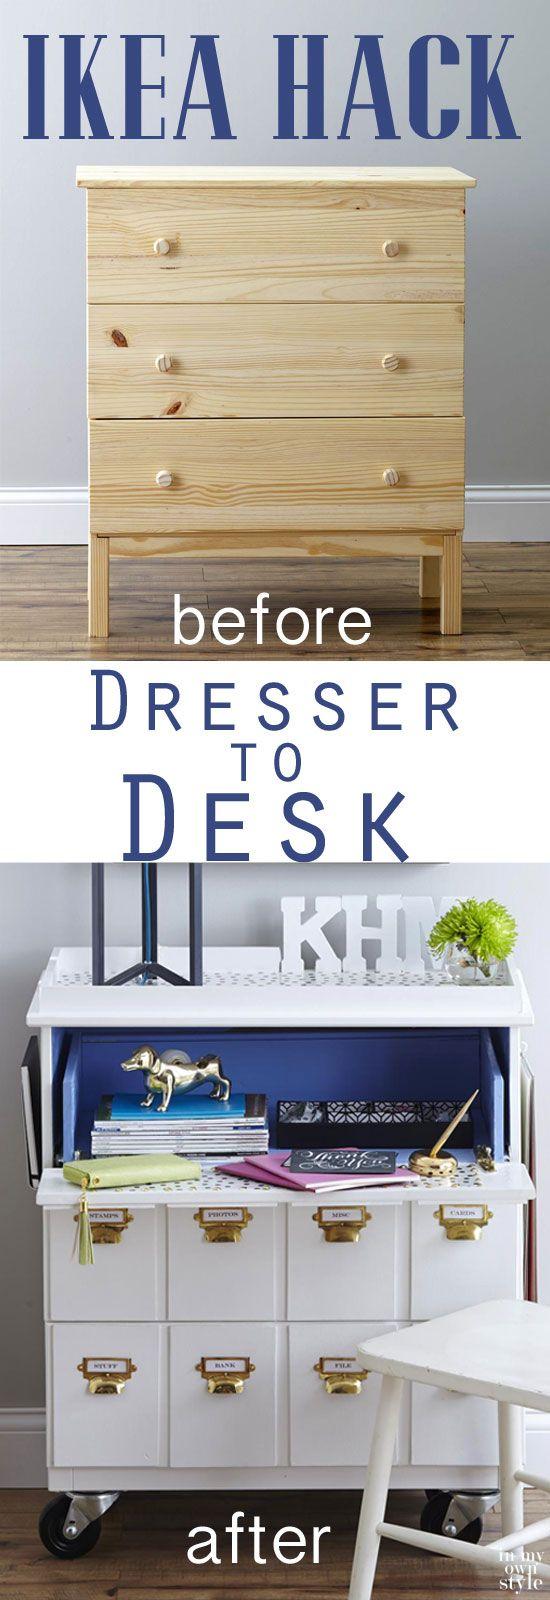 Diy sewing table ikea ikea hack tarva dresser into a rolling desk good tutorial lots of